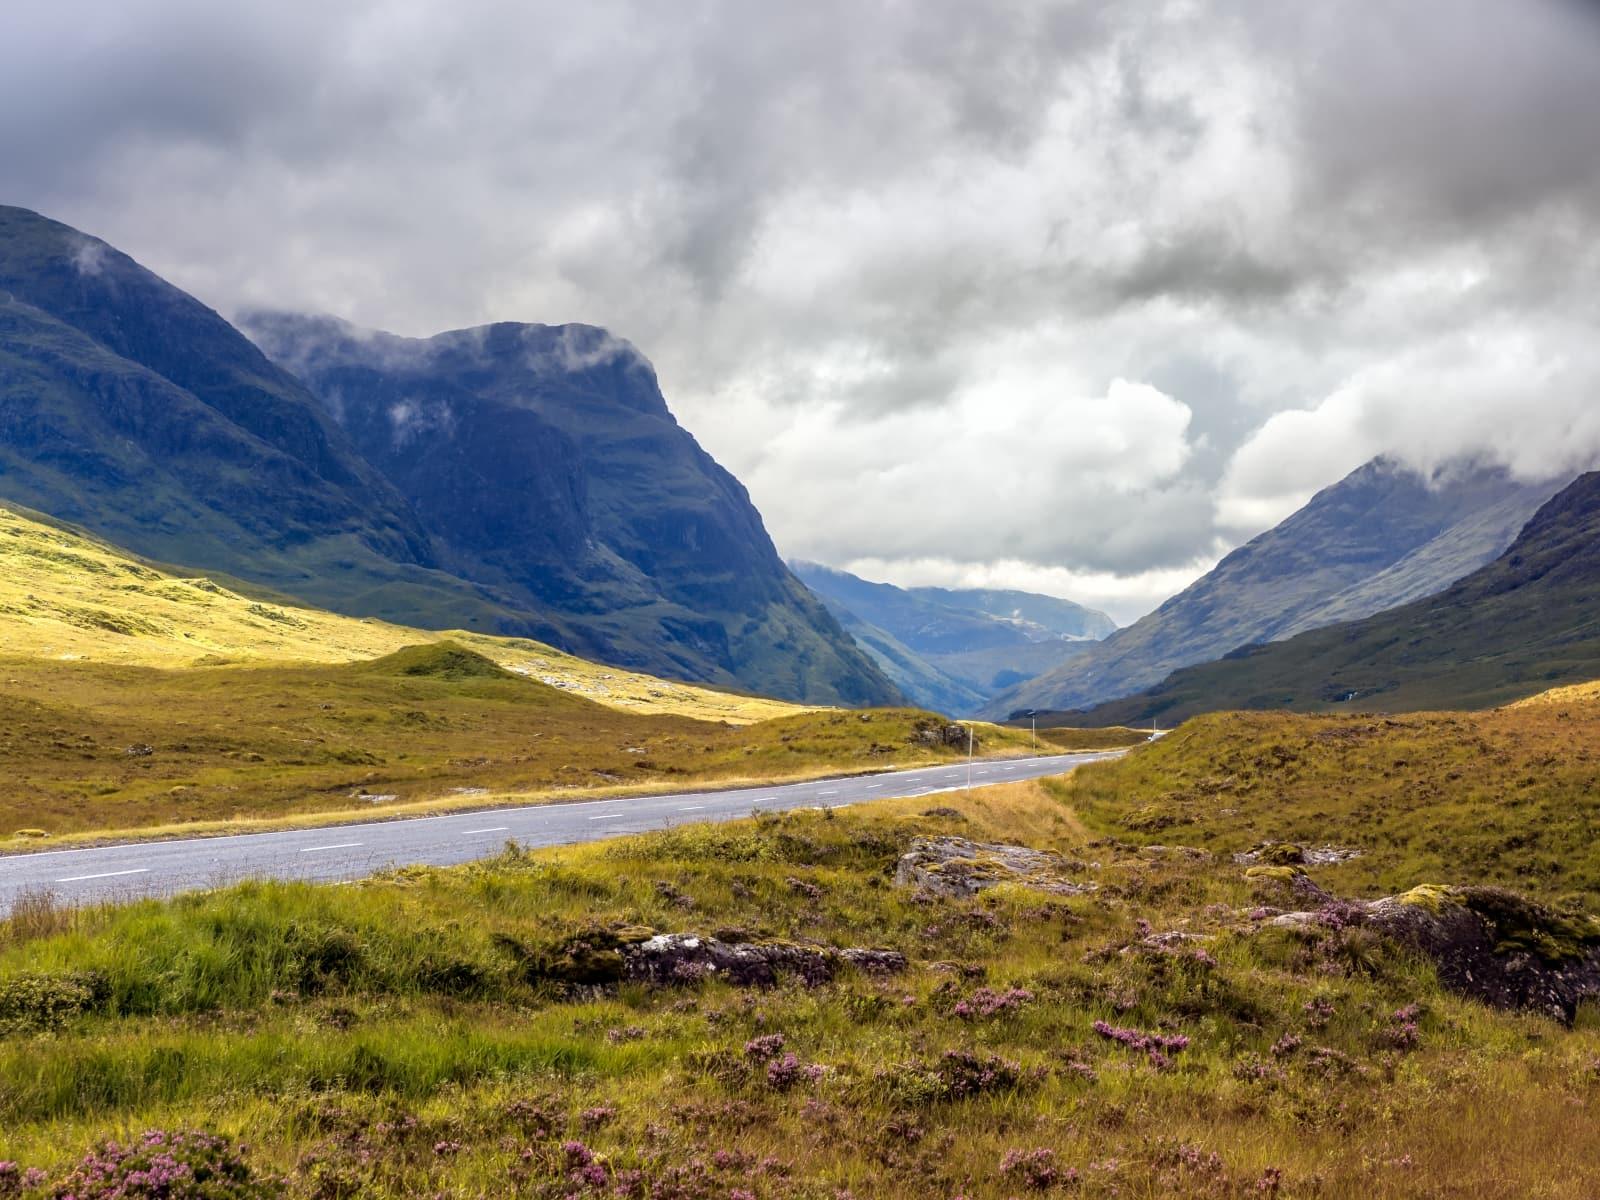 Schottland-8215750-Bearbeitet